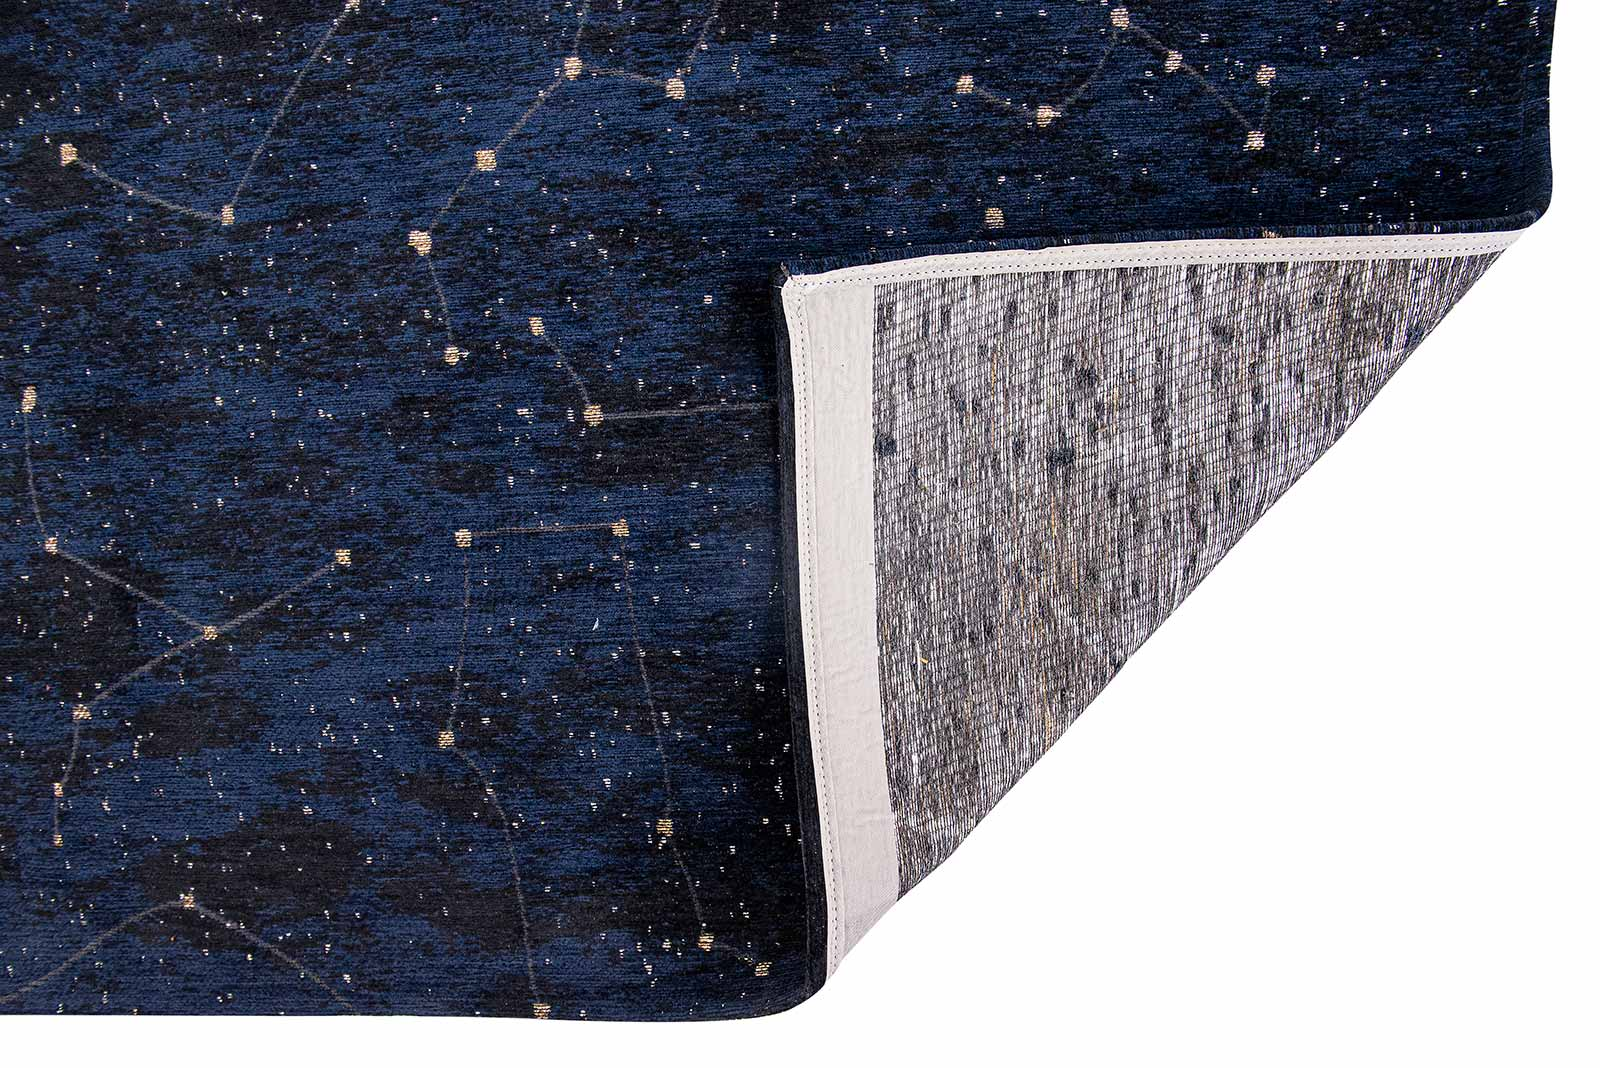 Louis De Poortere vloerkleed Fischbacher 9060 Celestial Midnight Blue back